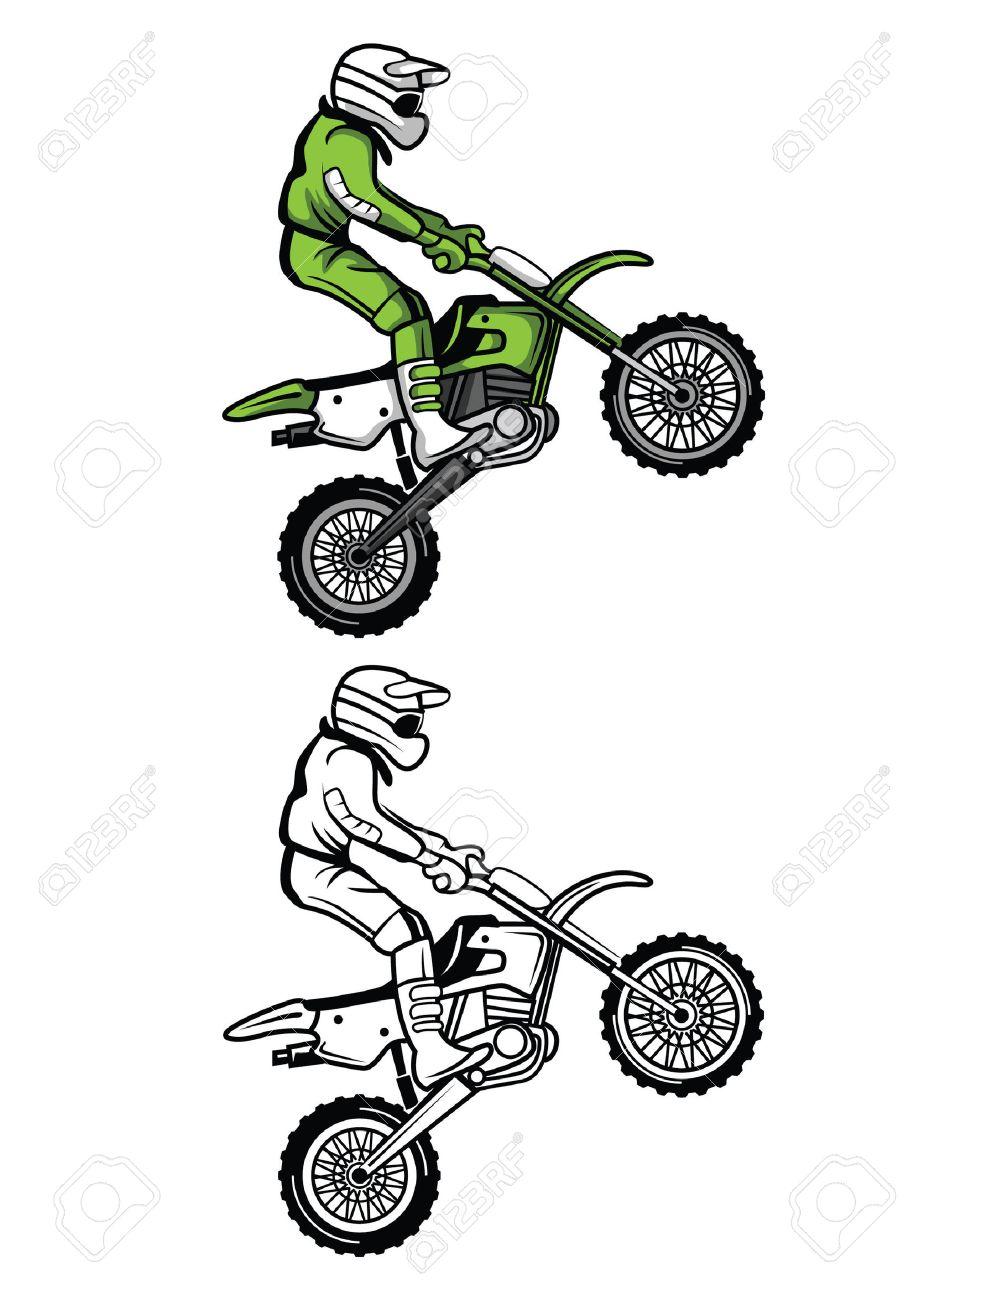 Personnage De Dessin Animé Livre De Coloriage Moto Cross